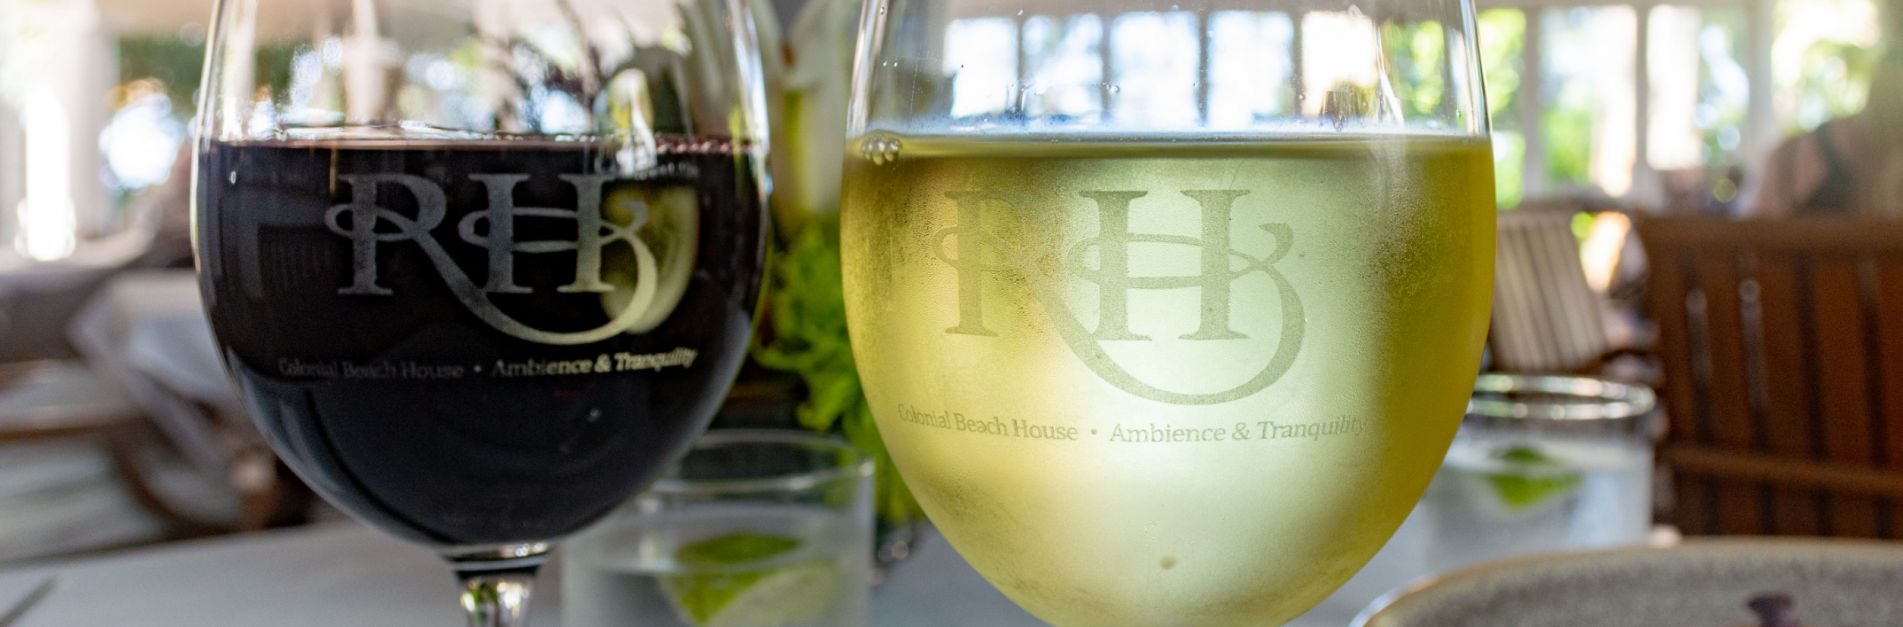 80-28082018133718-2-521-2508-826-1903x627-cropped-rh-wine-glasses